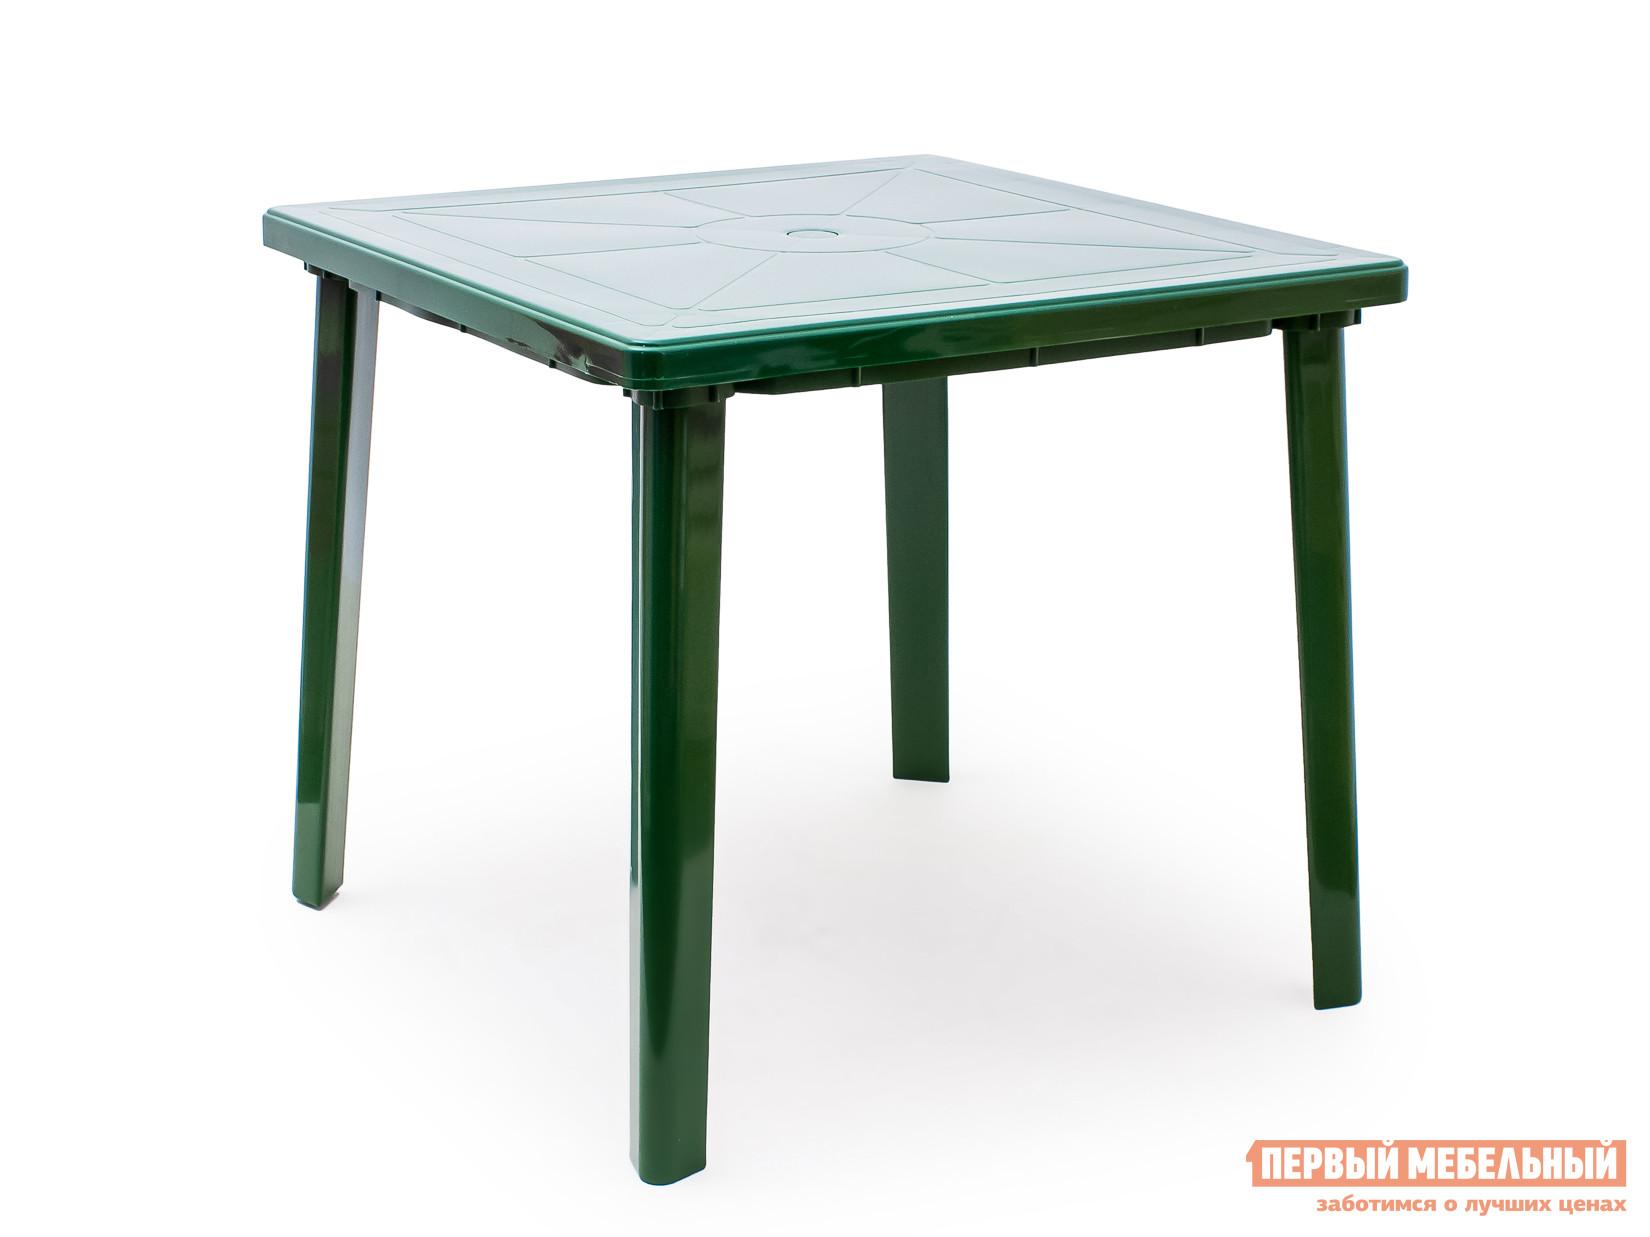 Пластиковый стол Стандарт Пластик Стол квадратный (800х800х710) Темно-зеленый